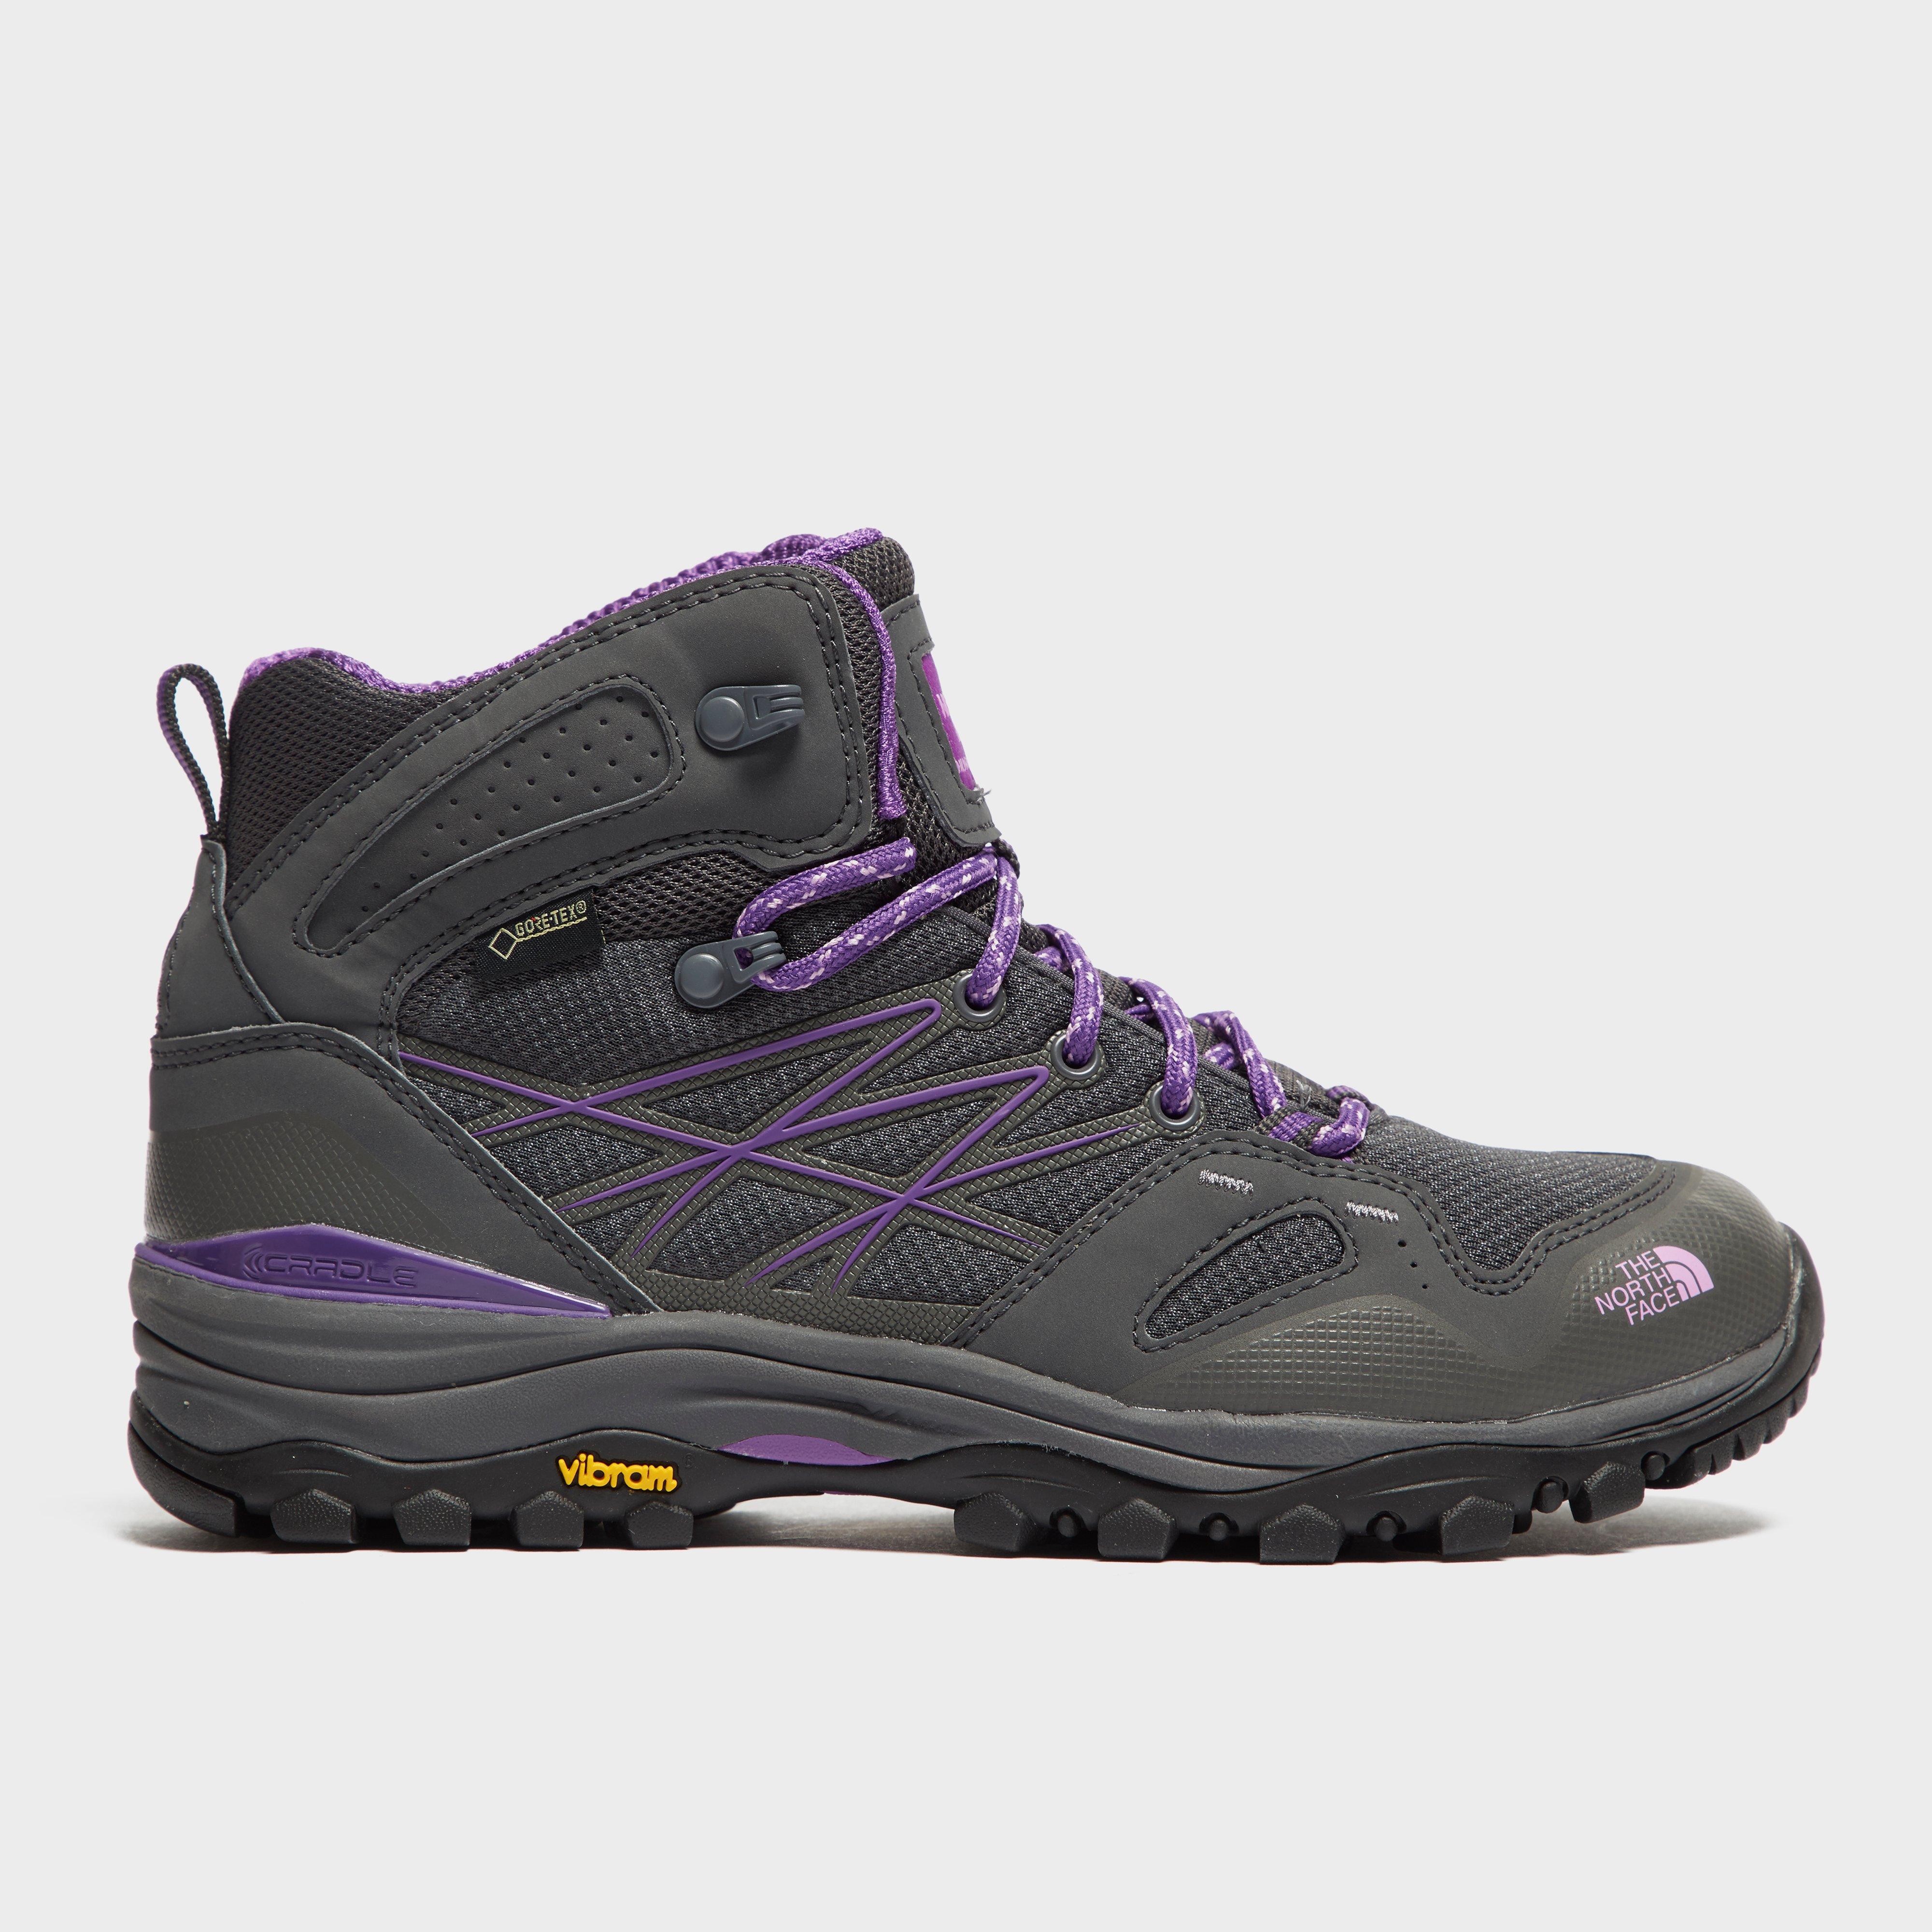 527cffcbf Women's Hedgehog GORE-TEX® Boots